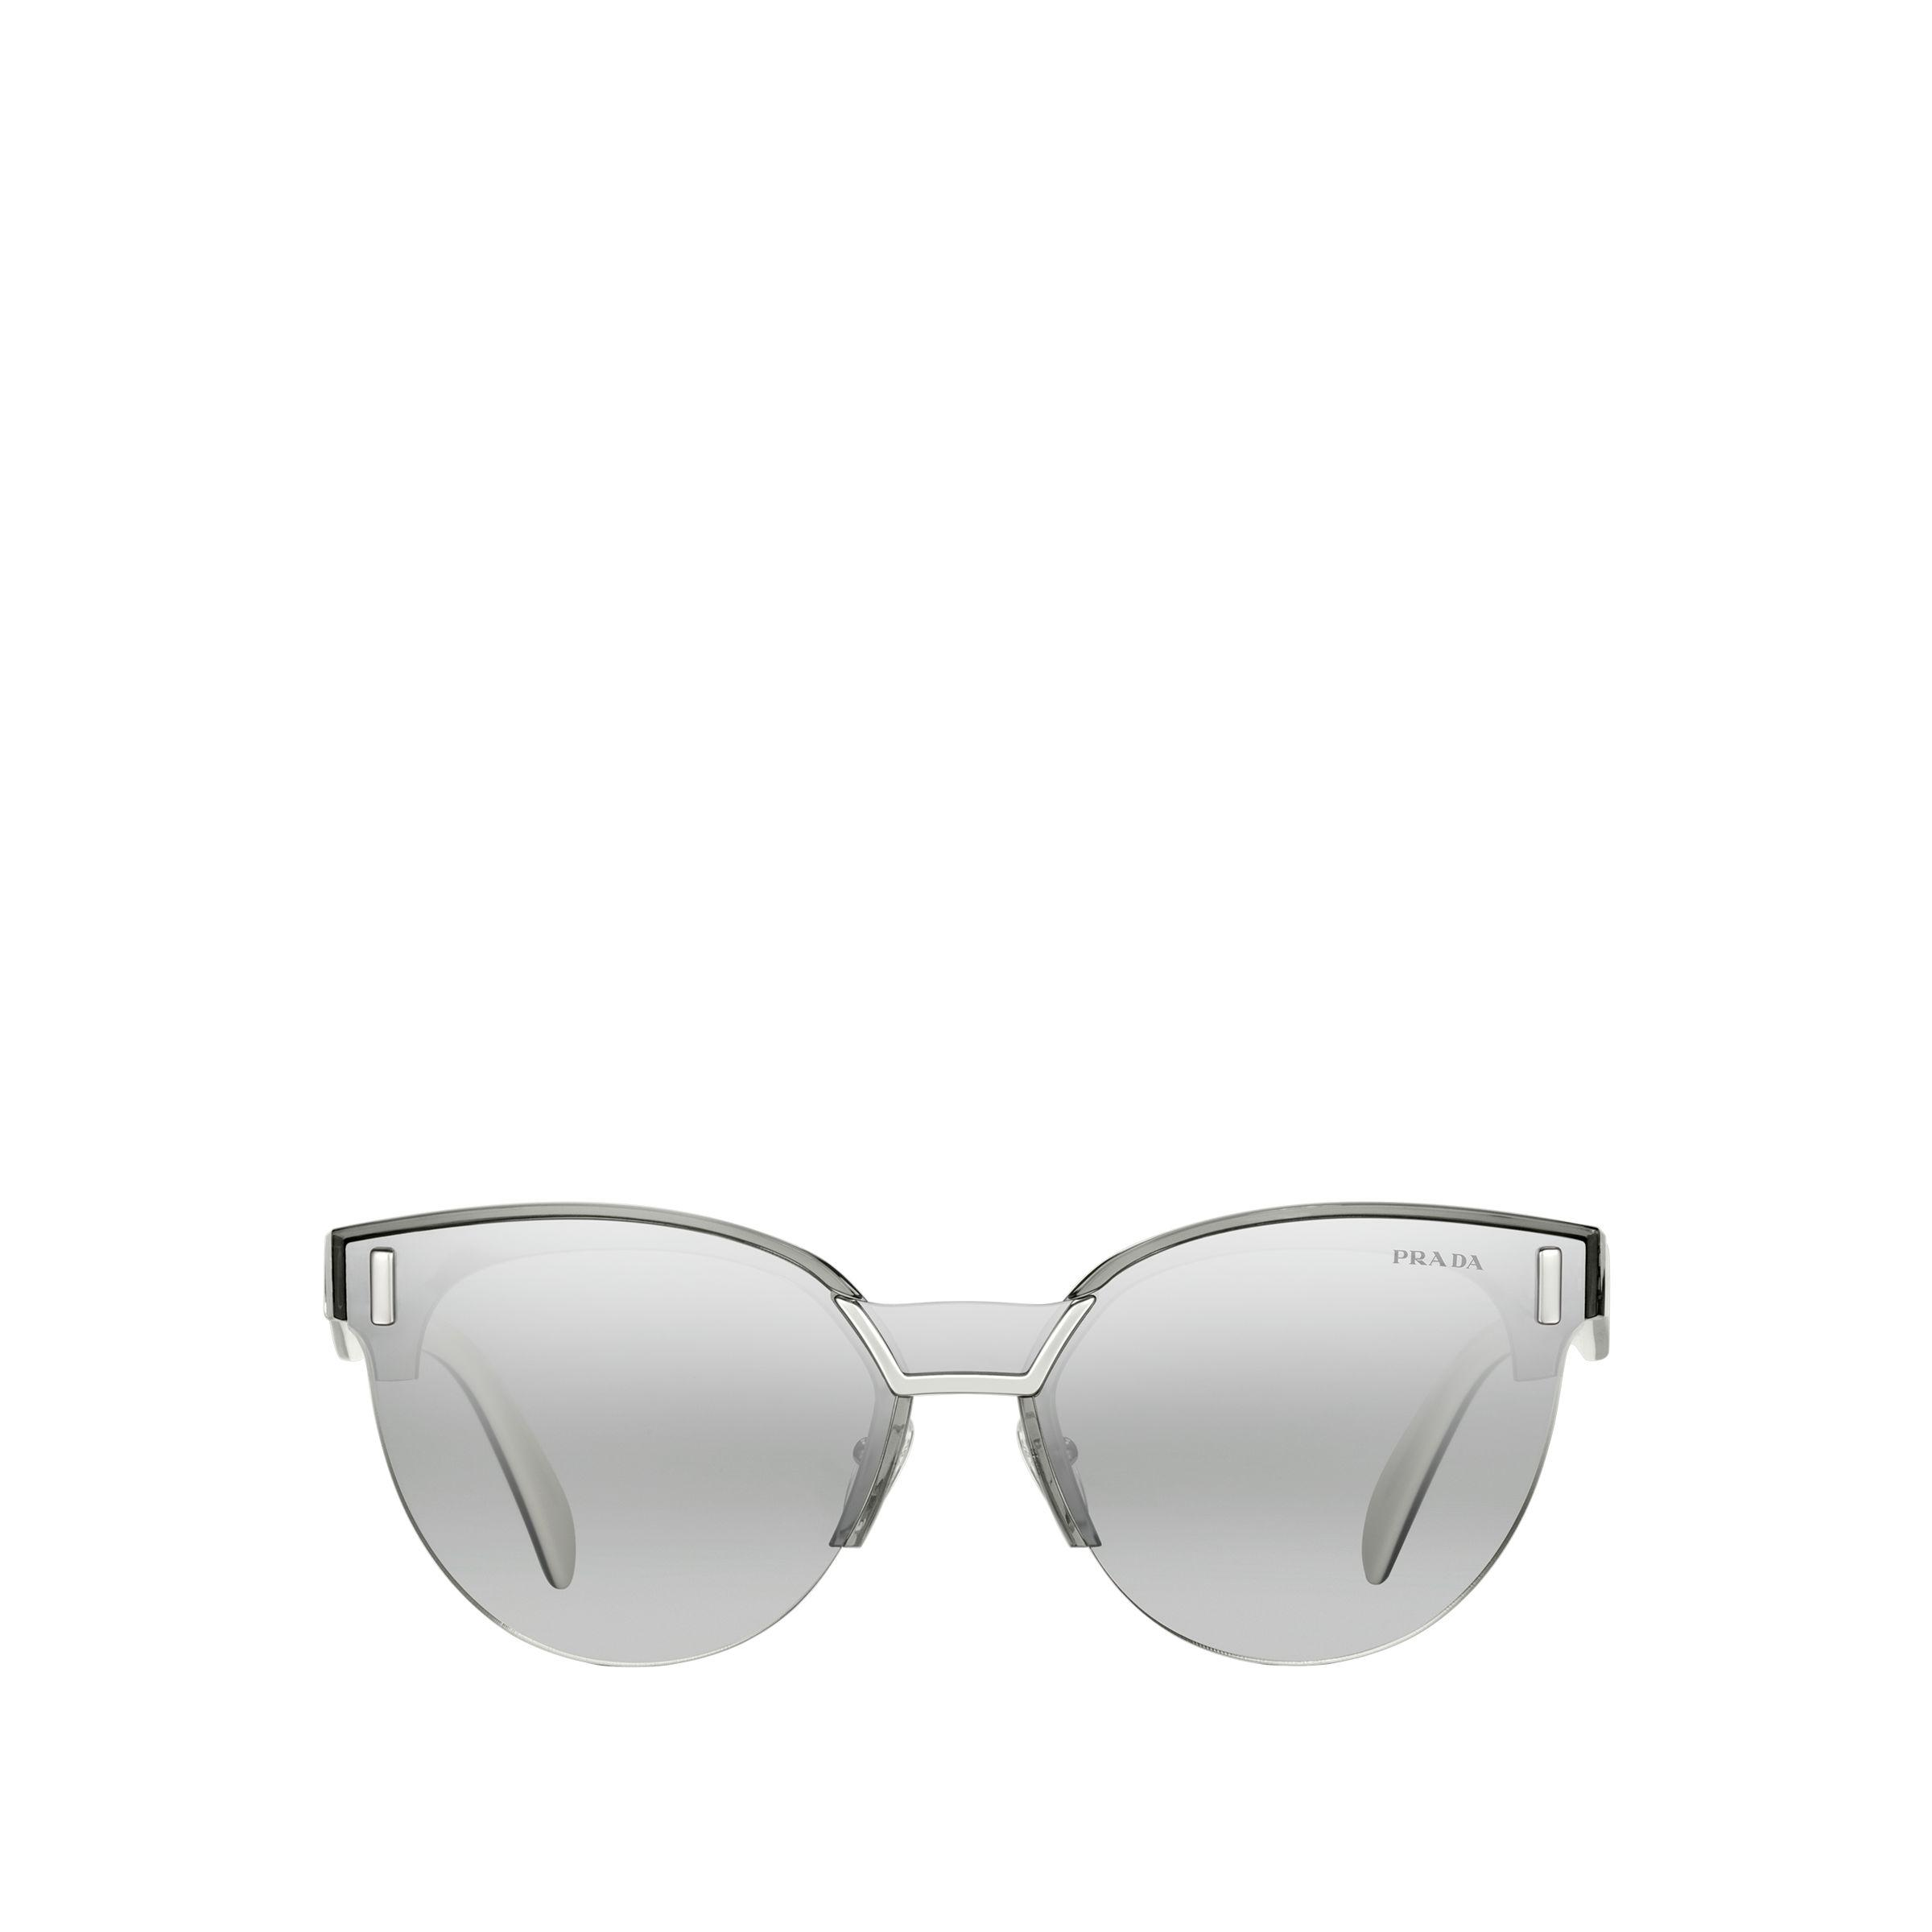 5bc8807d47b56 Prada - Multicolor Hide Sunglasses - Lyst. View fullscreen